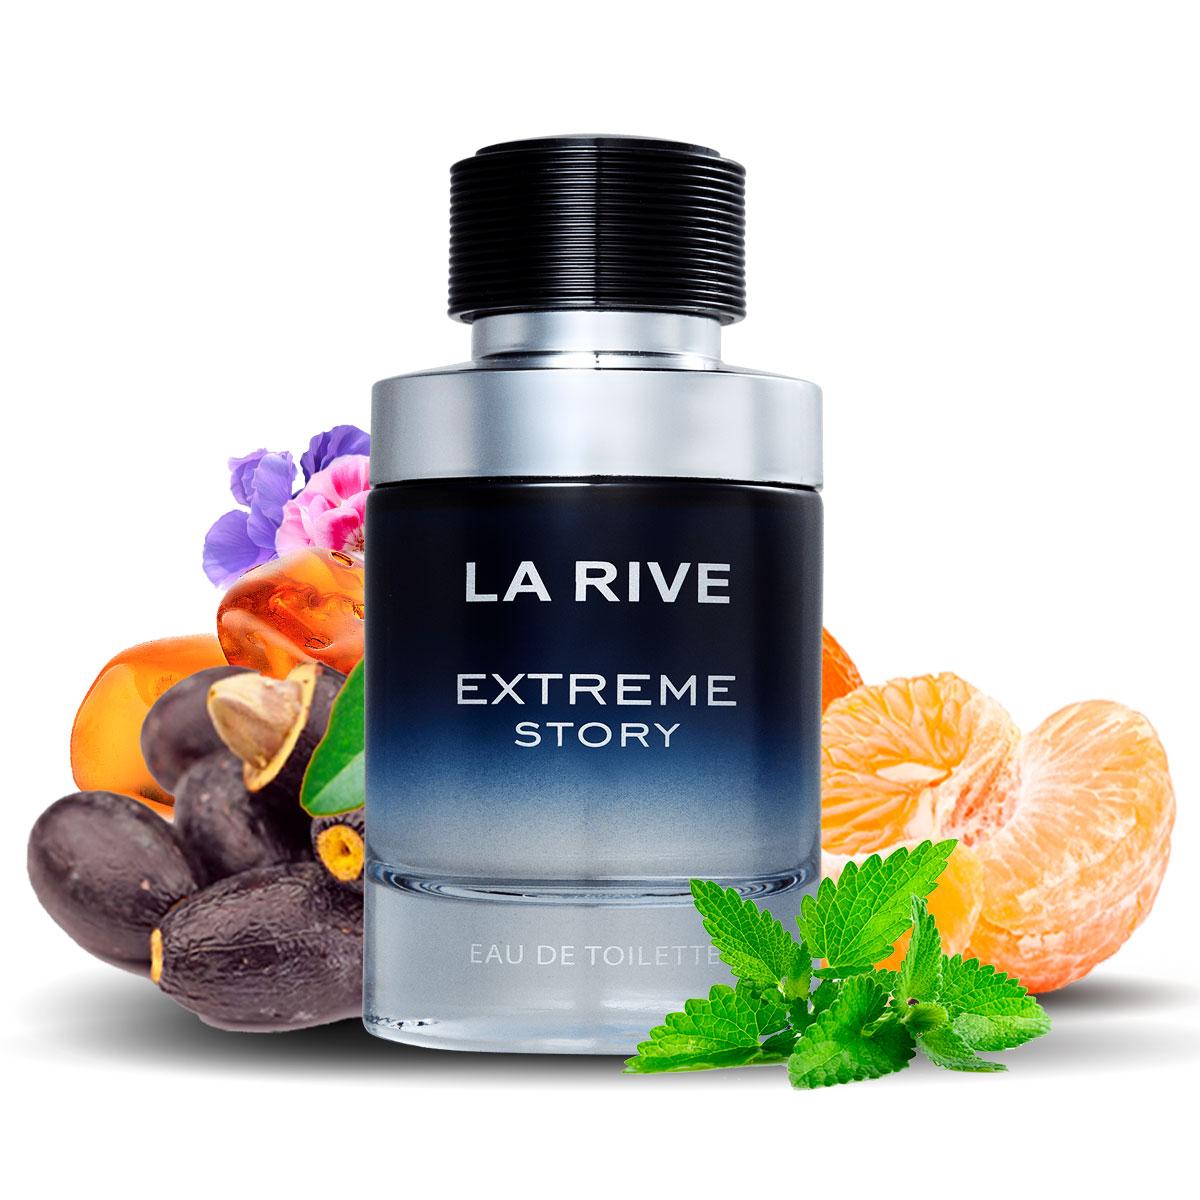 Kit 2 Perfumes La Rive Extreme Story 75ml + LR Password 75ml  - Mercari Perfumes